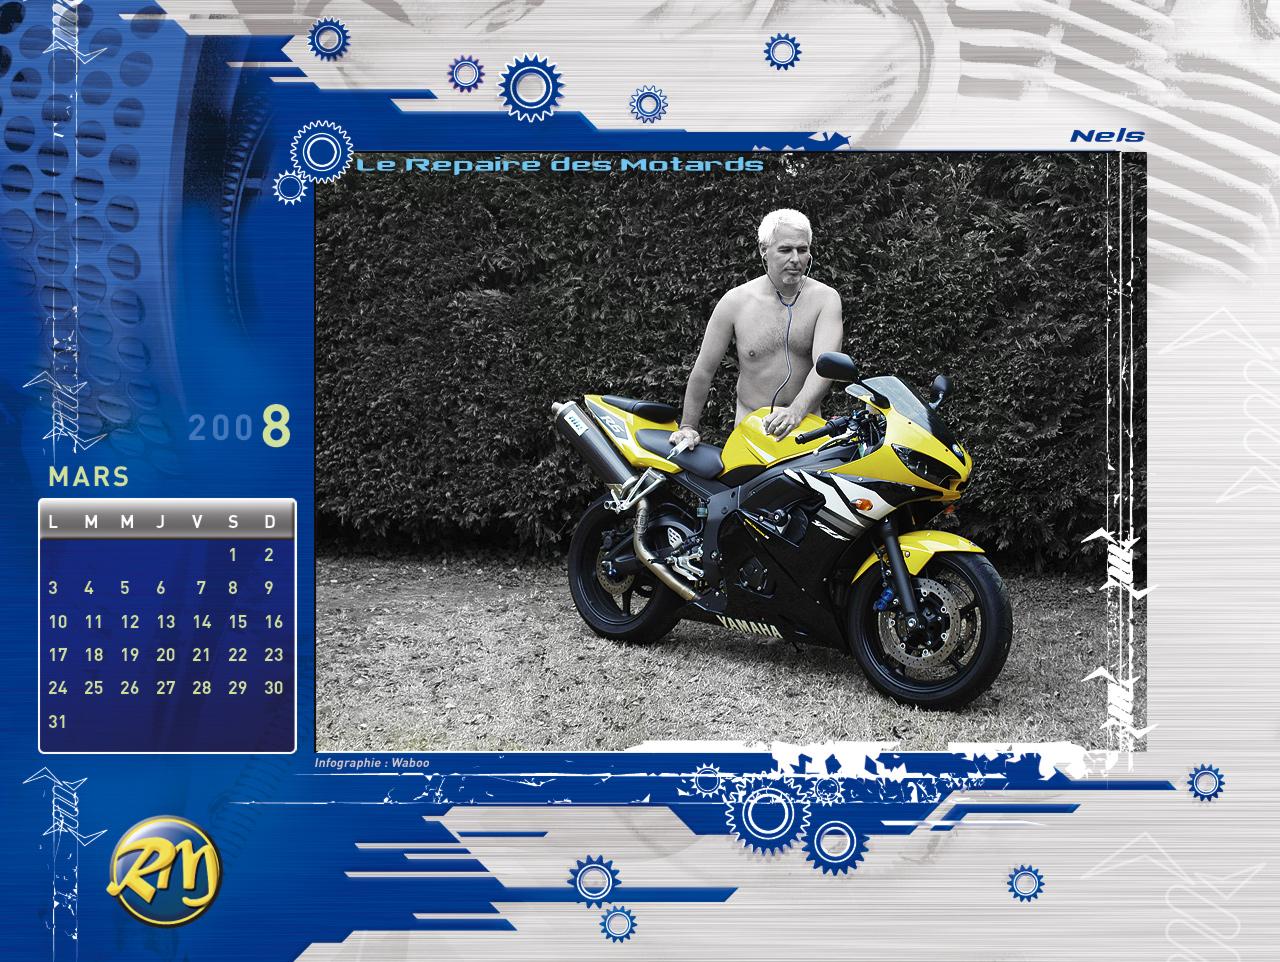 Beaux mecs en moto - Page 2 Mars2008_